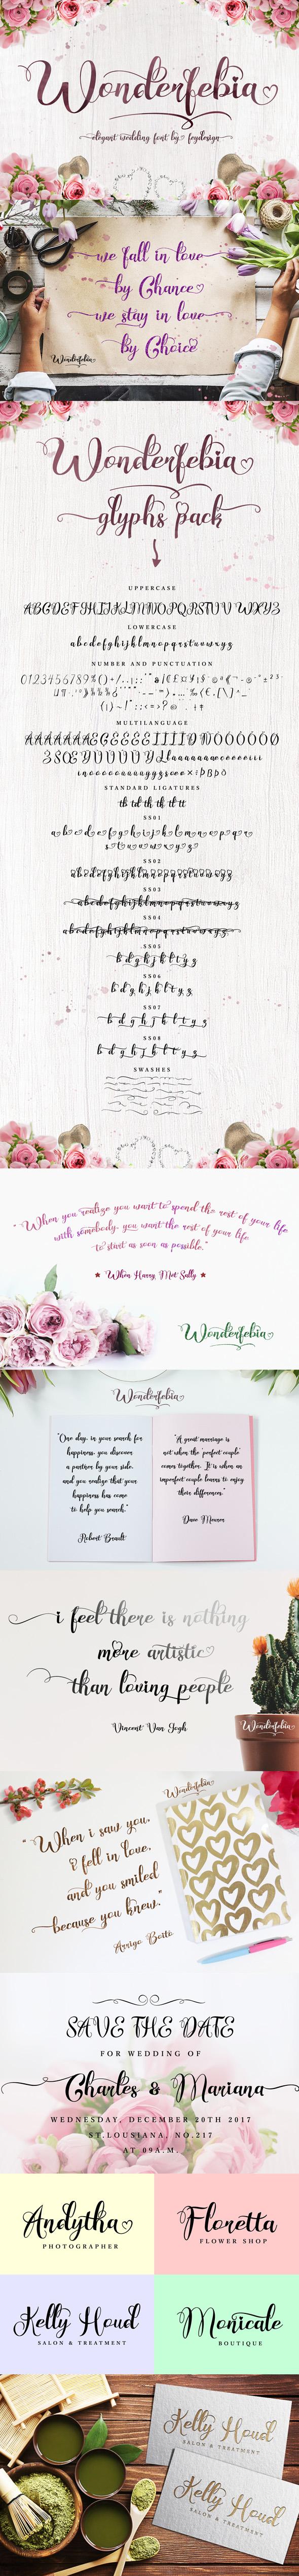 Wonderfebia - Script Wedding Font - Script Fonts